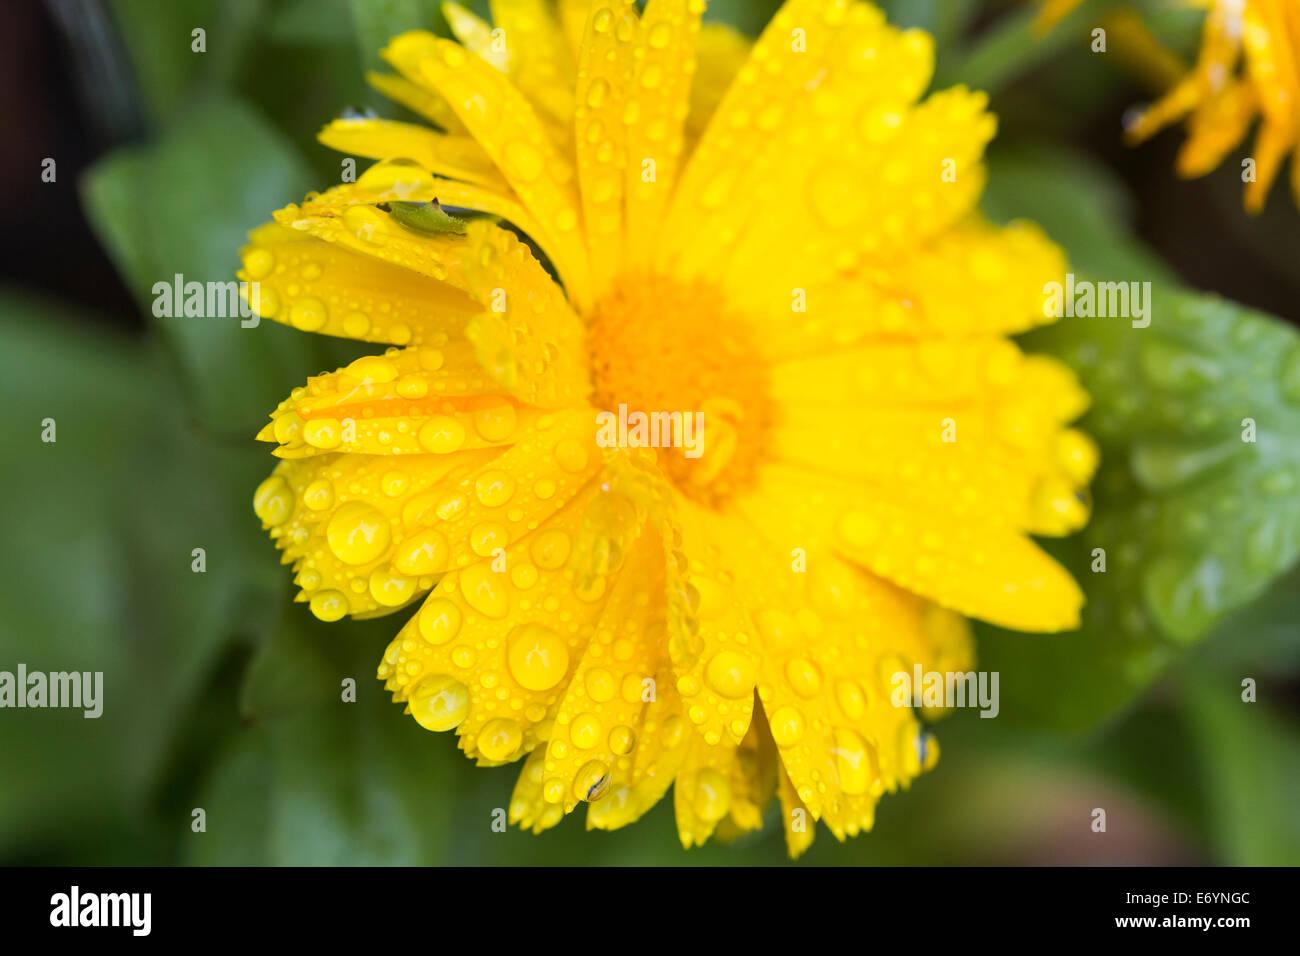 Summer rain drops on a Garden plant Marigold yellow flower - Stock Image